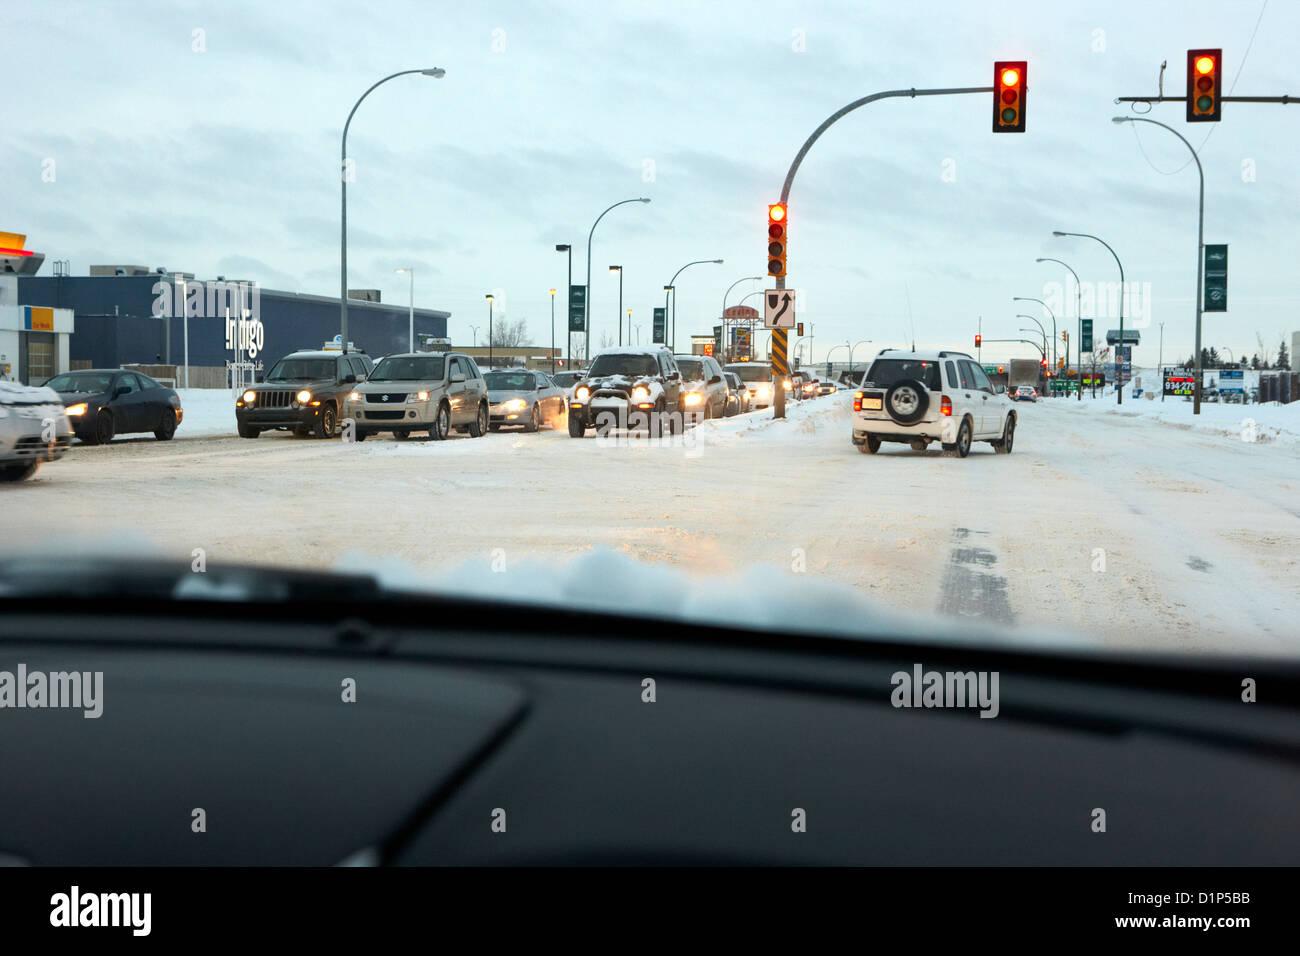 looking through car windshield at snow covered city intersection Saskatoon Saskatchewan Canada - Stock Image